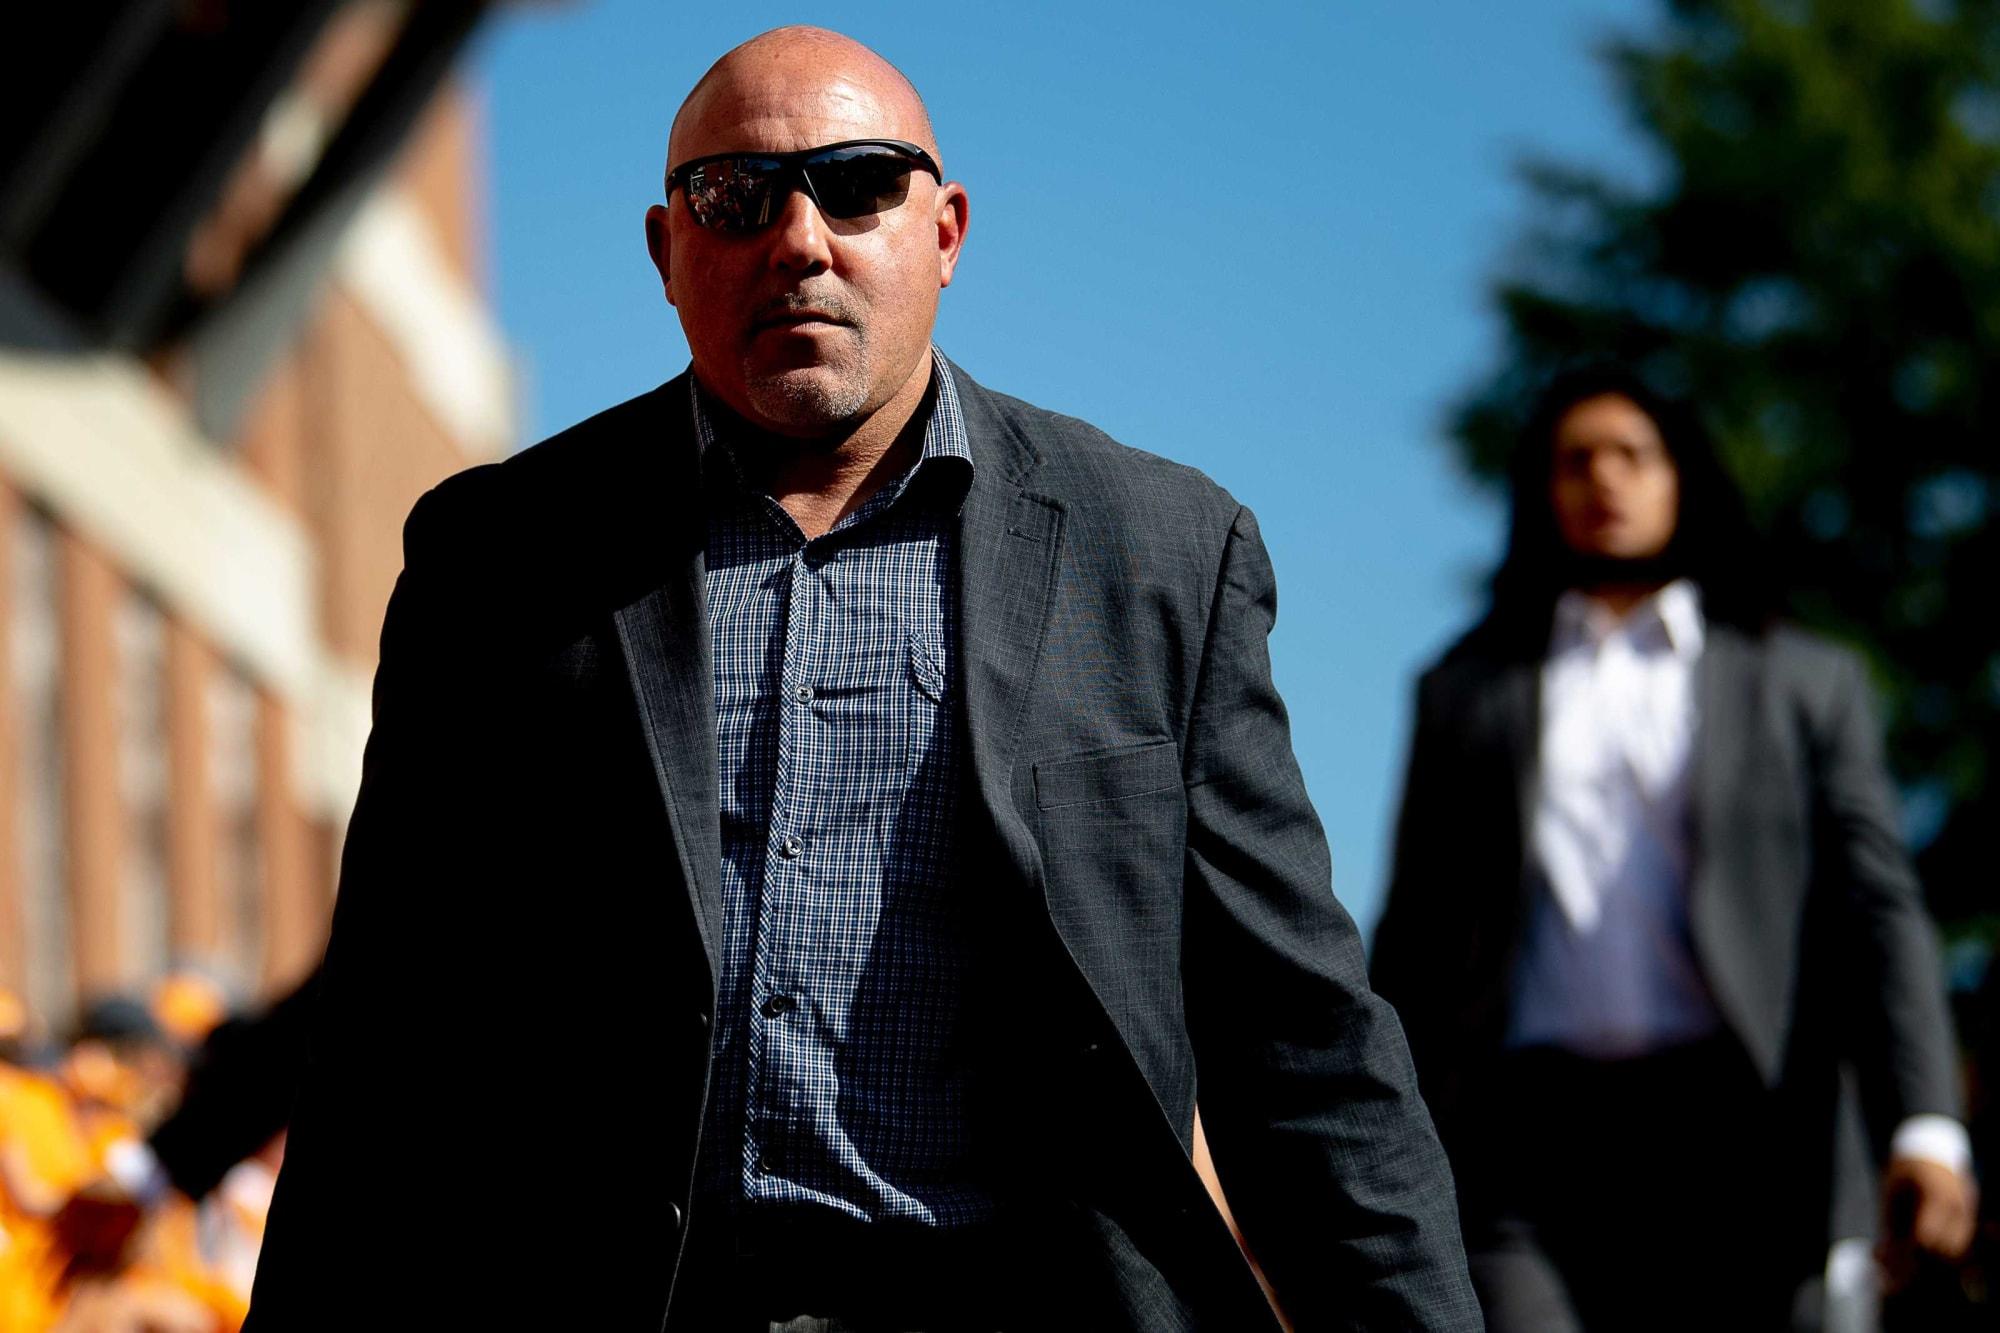 Tennessee football: Joe Osovet eyeing UCF should humiliate Jeremy Pruitt